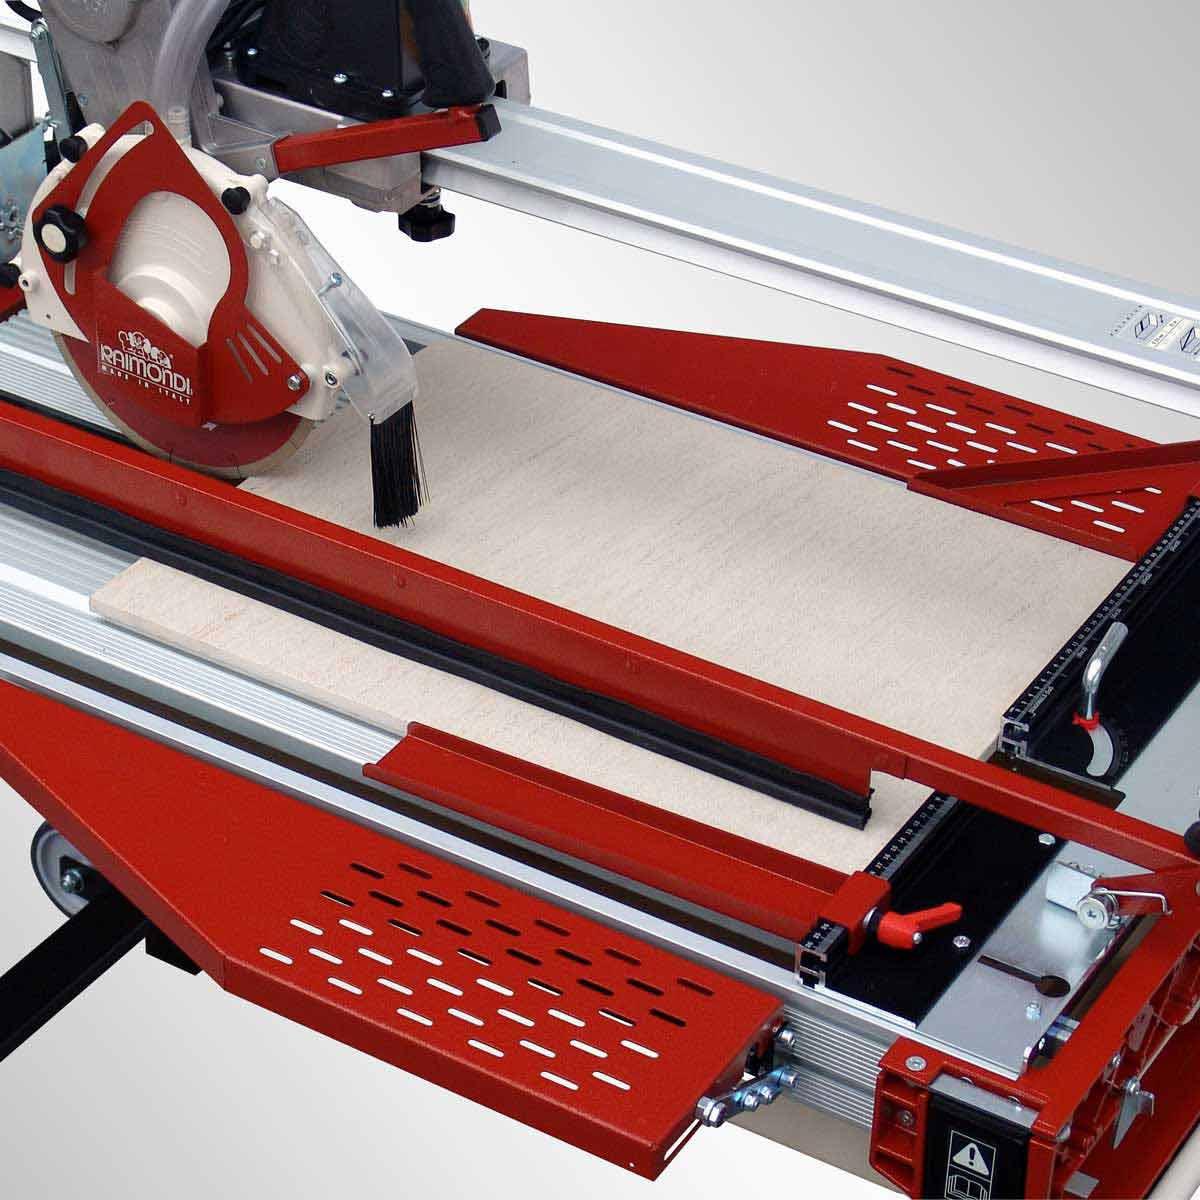 Raimondi Gladiator Advance Rail Saw folding extension tables